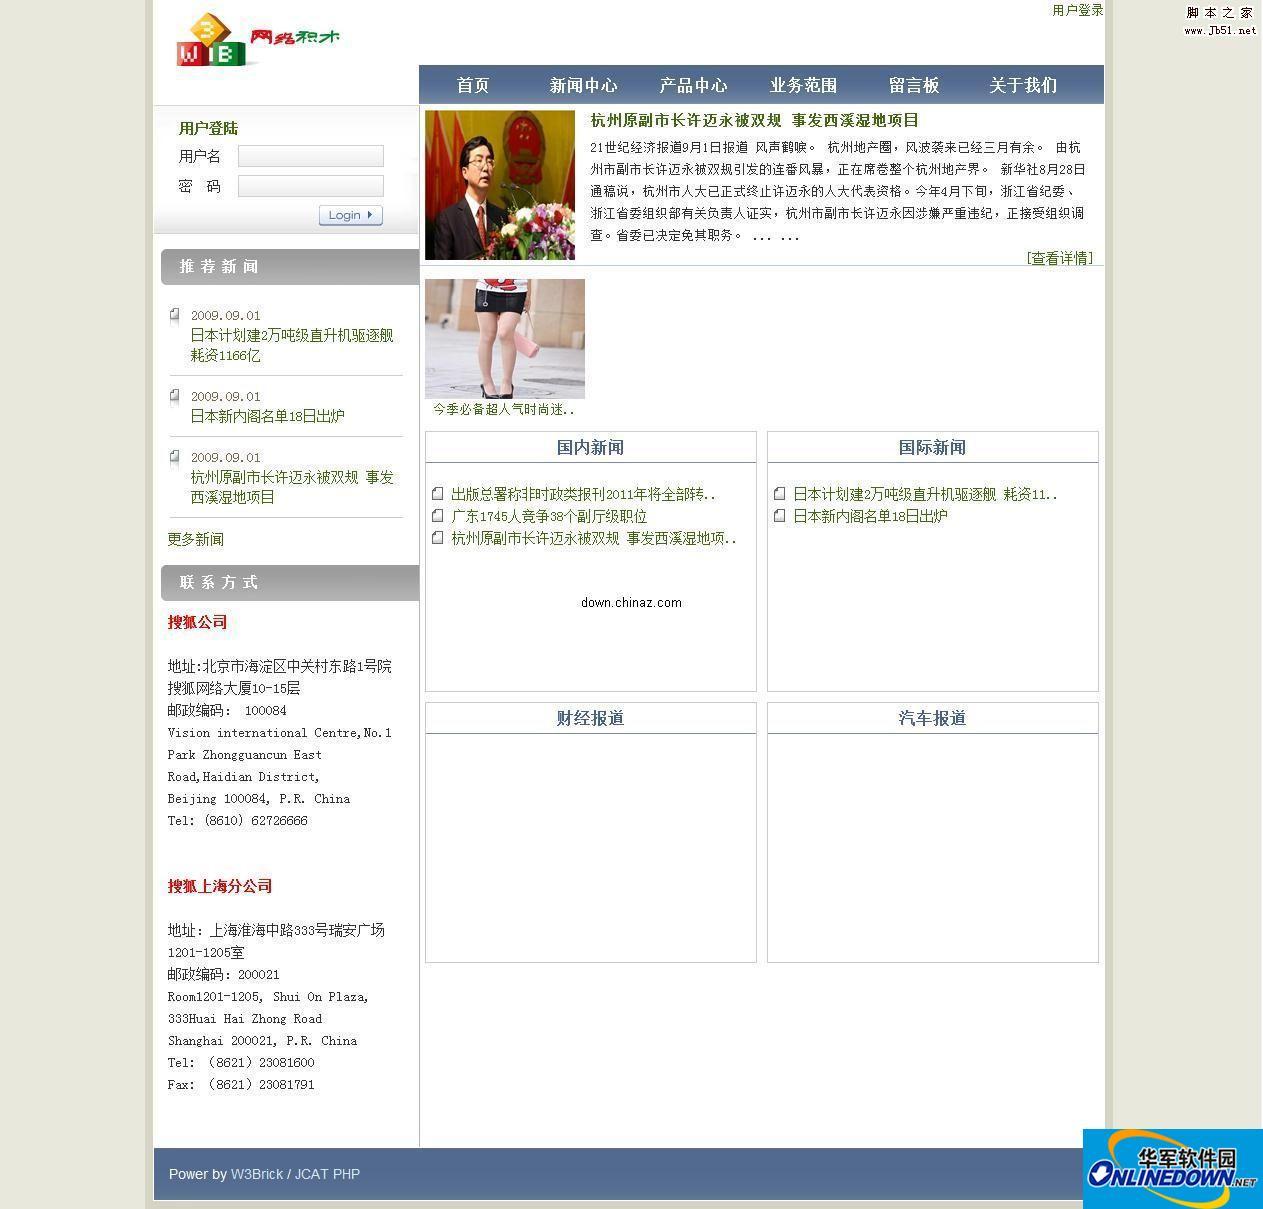 w3b php 企业网站管理系统0.1.2 正式版 PC版